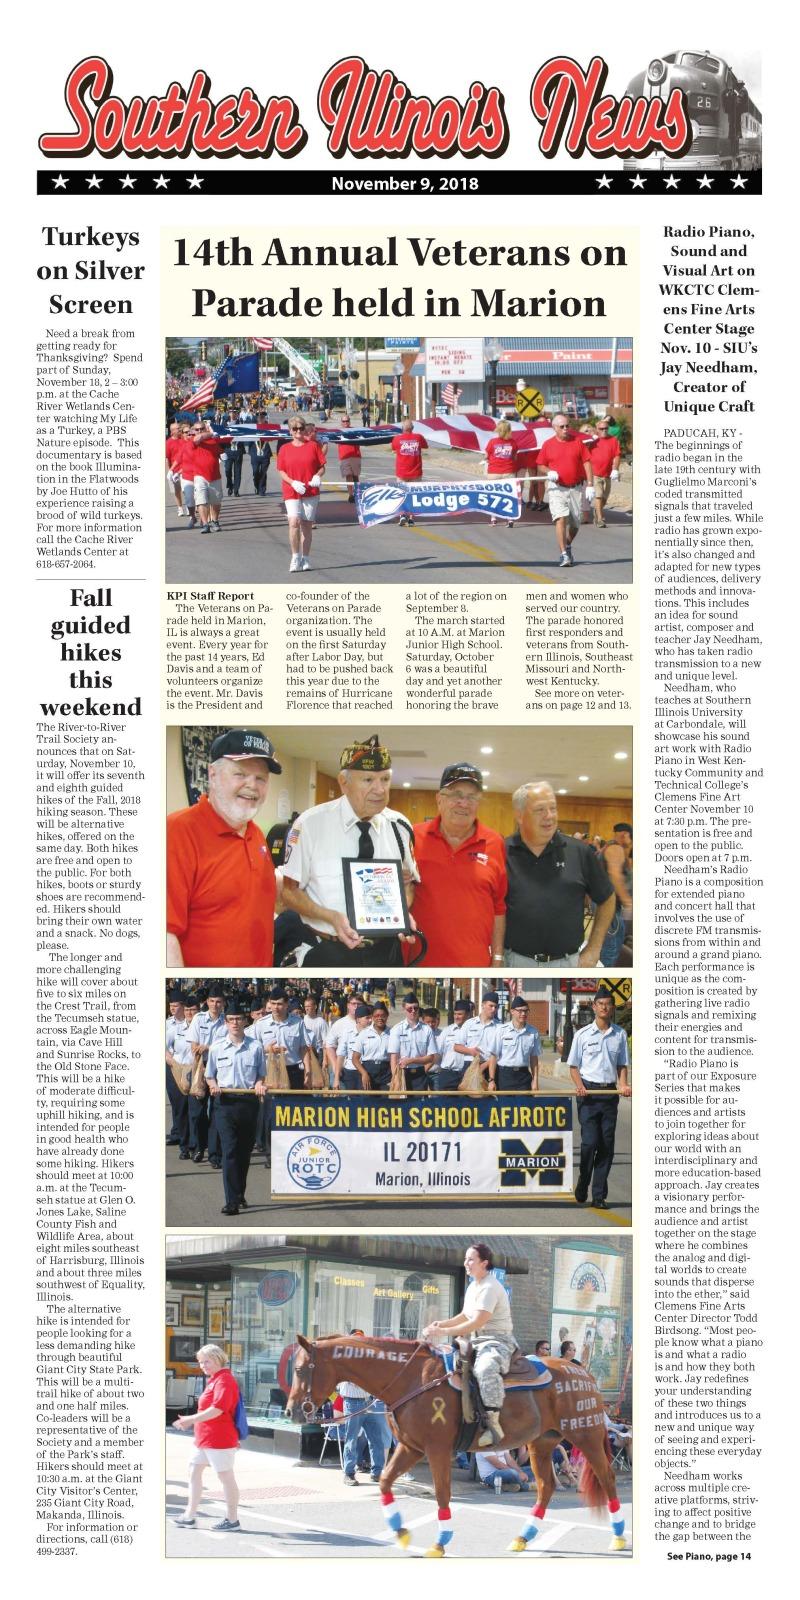 Southern Illinois News 11-9-18